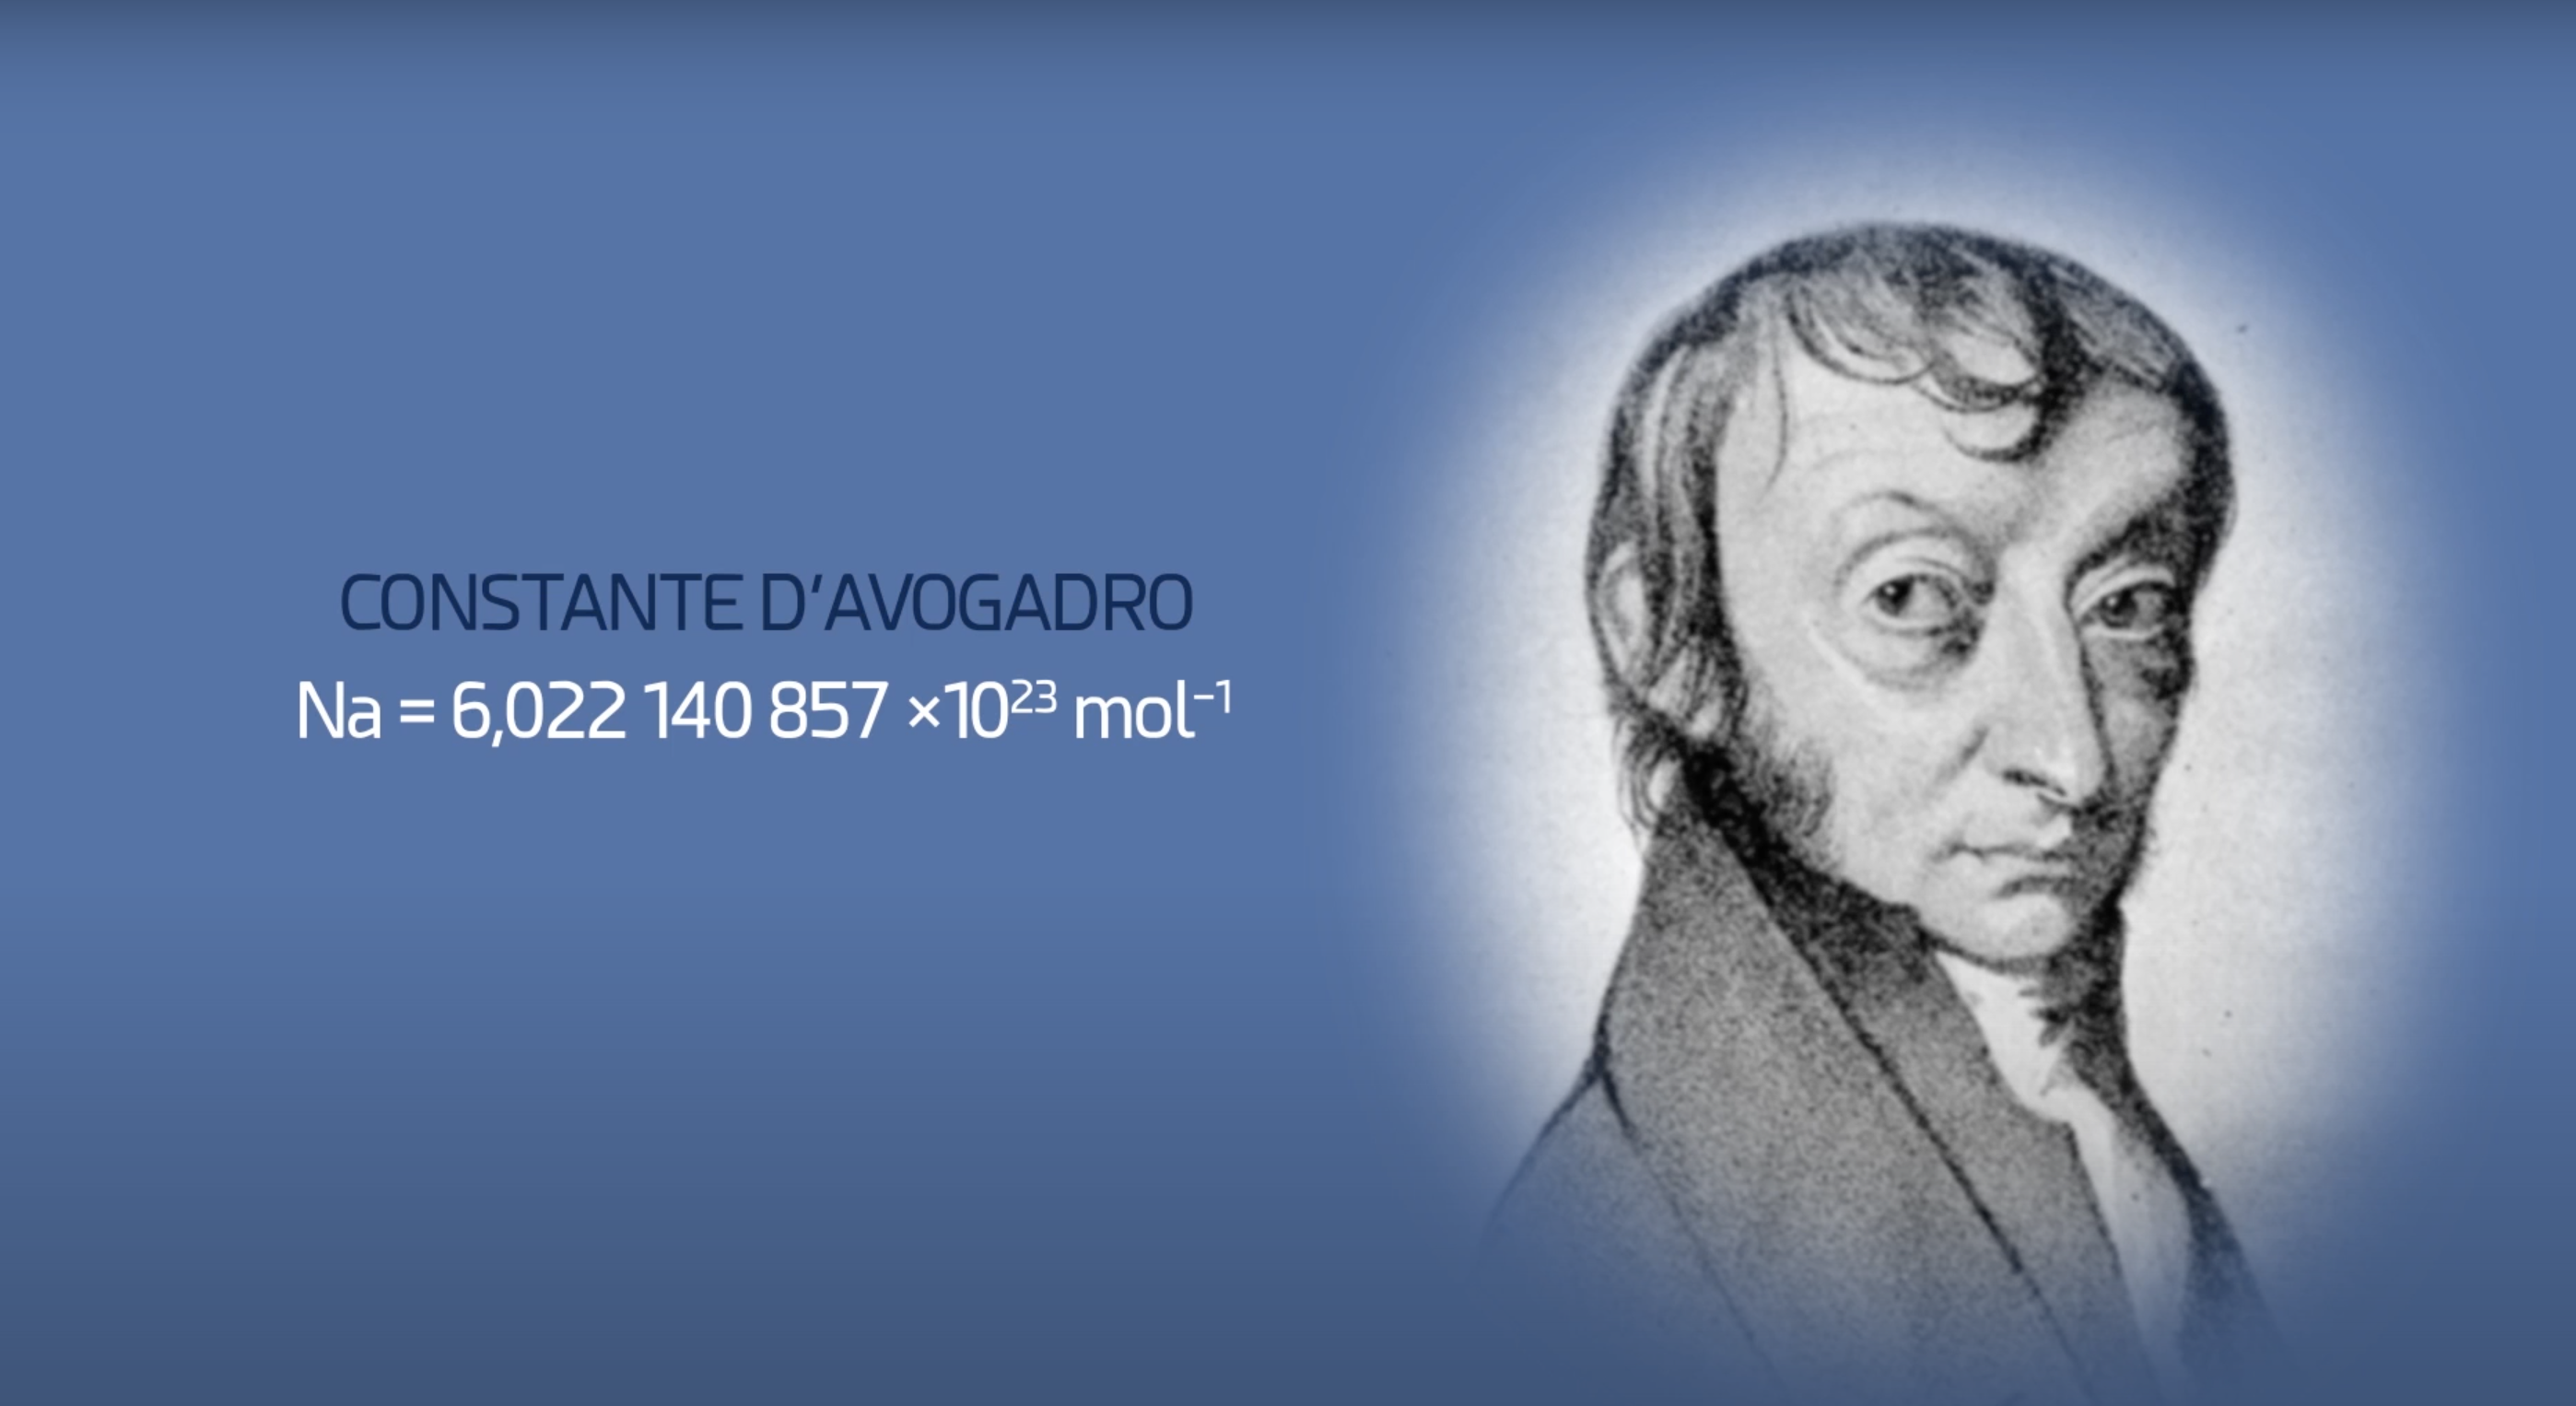 La constante d'Avogadro (vidéo)